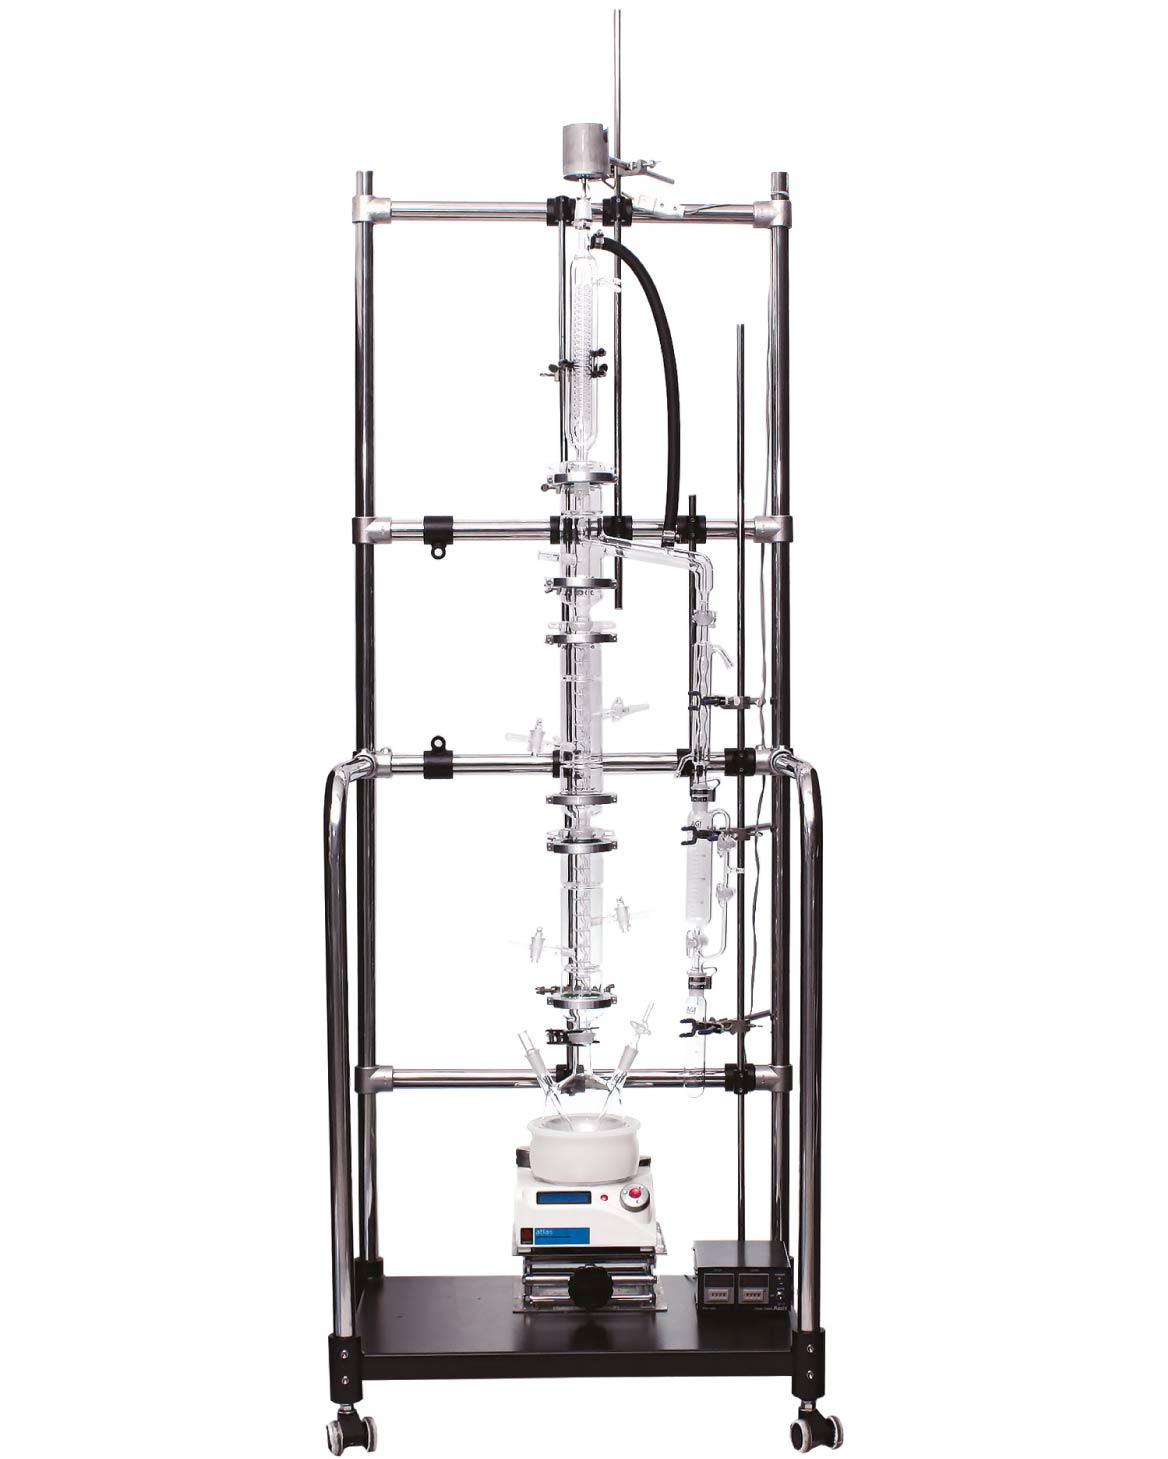 AGI Distillation